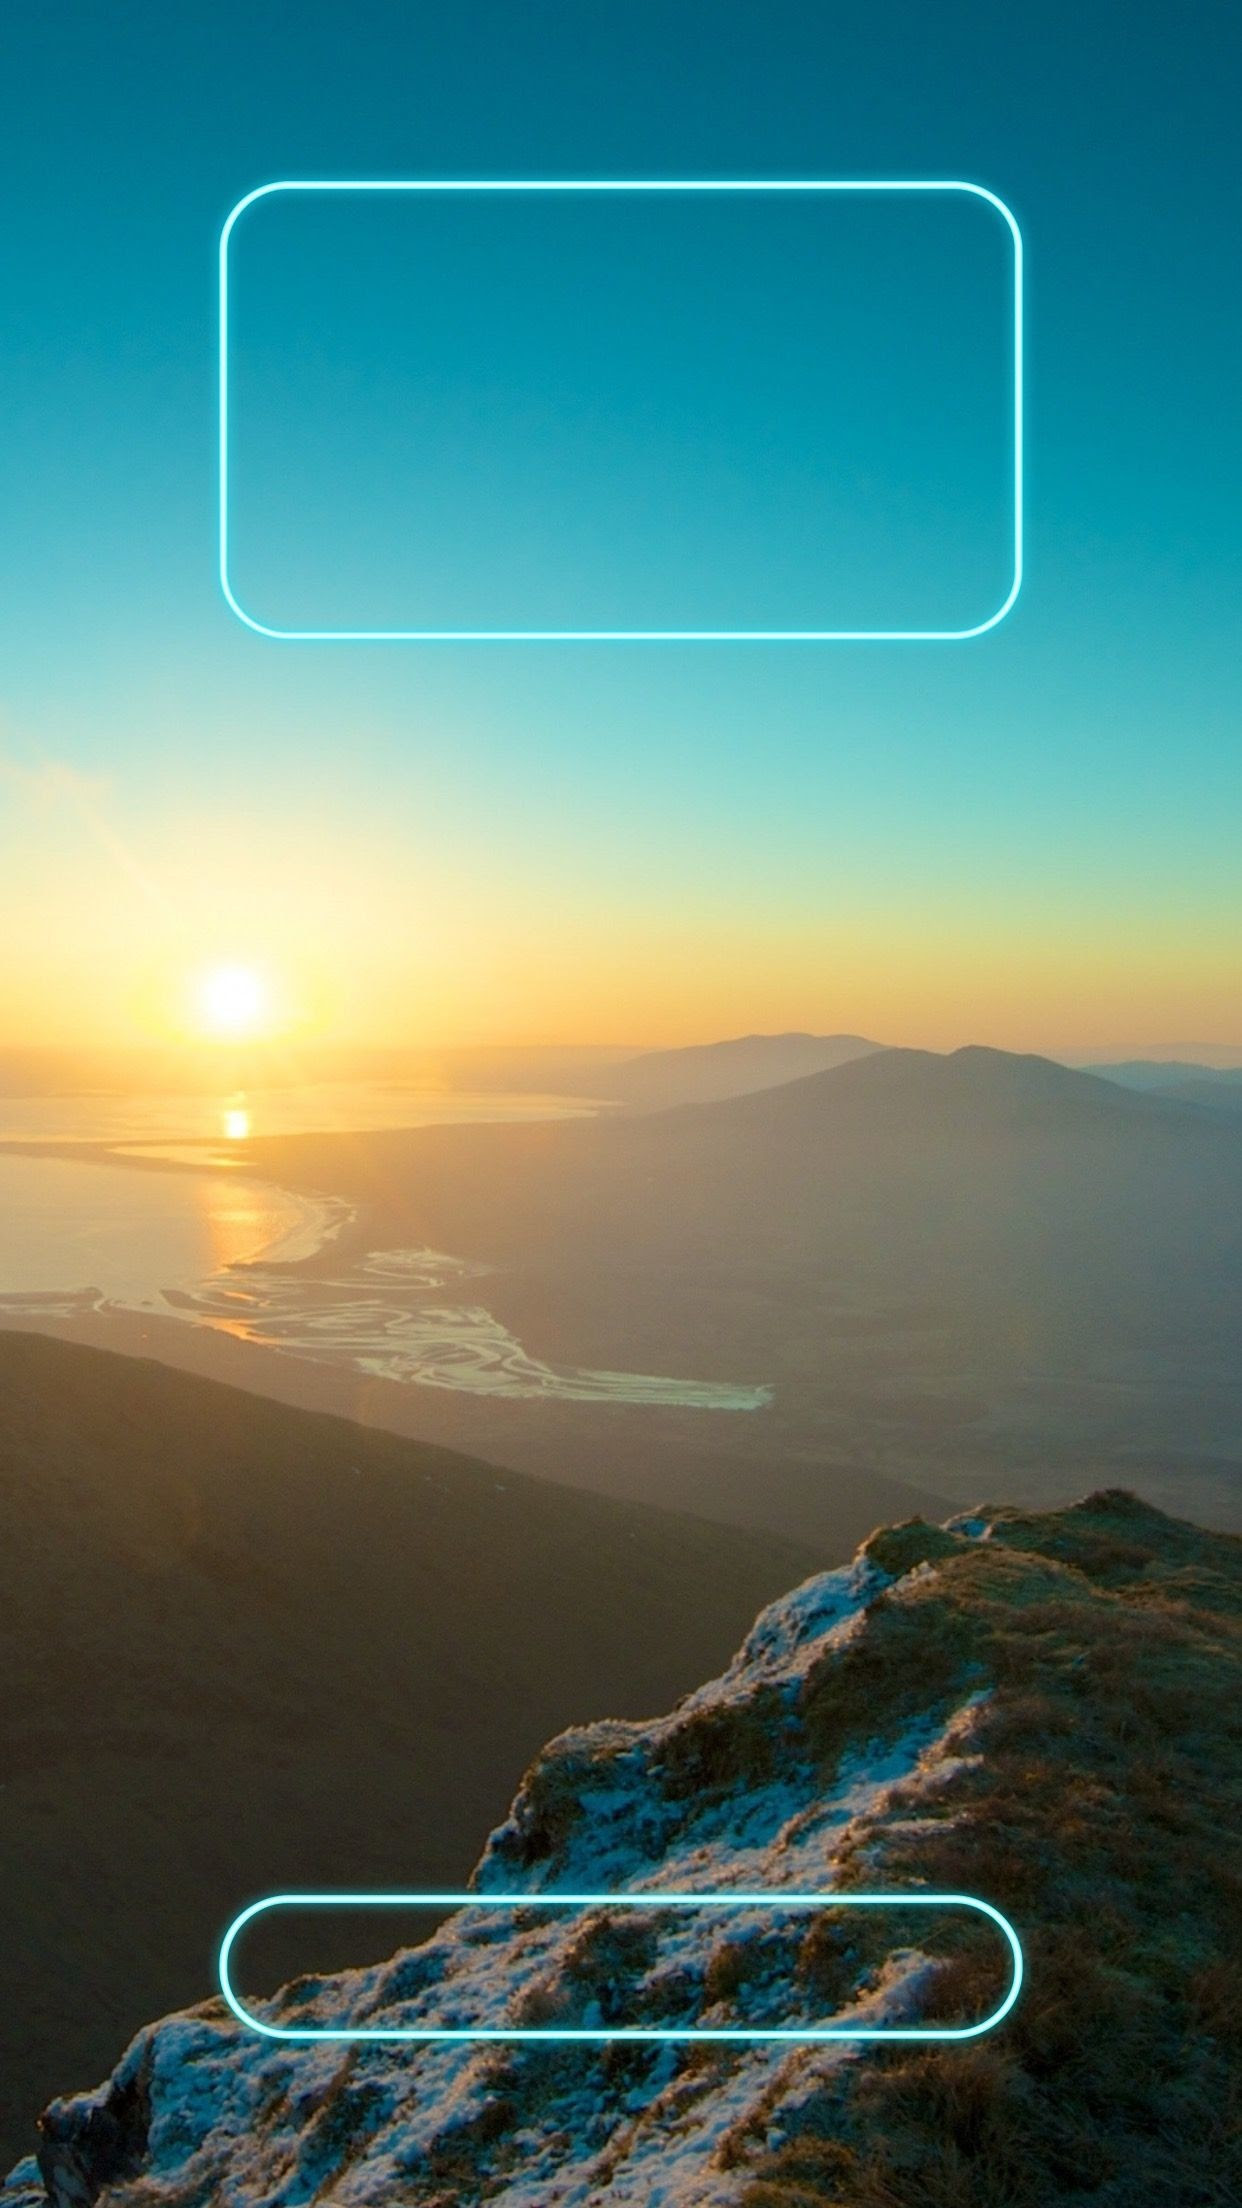 Download 600 Wallpaper Iphone Lockscreen HD